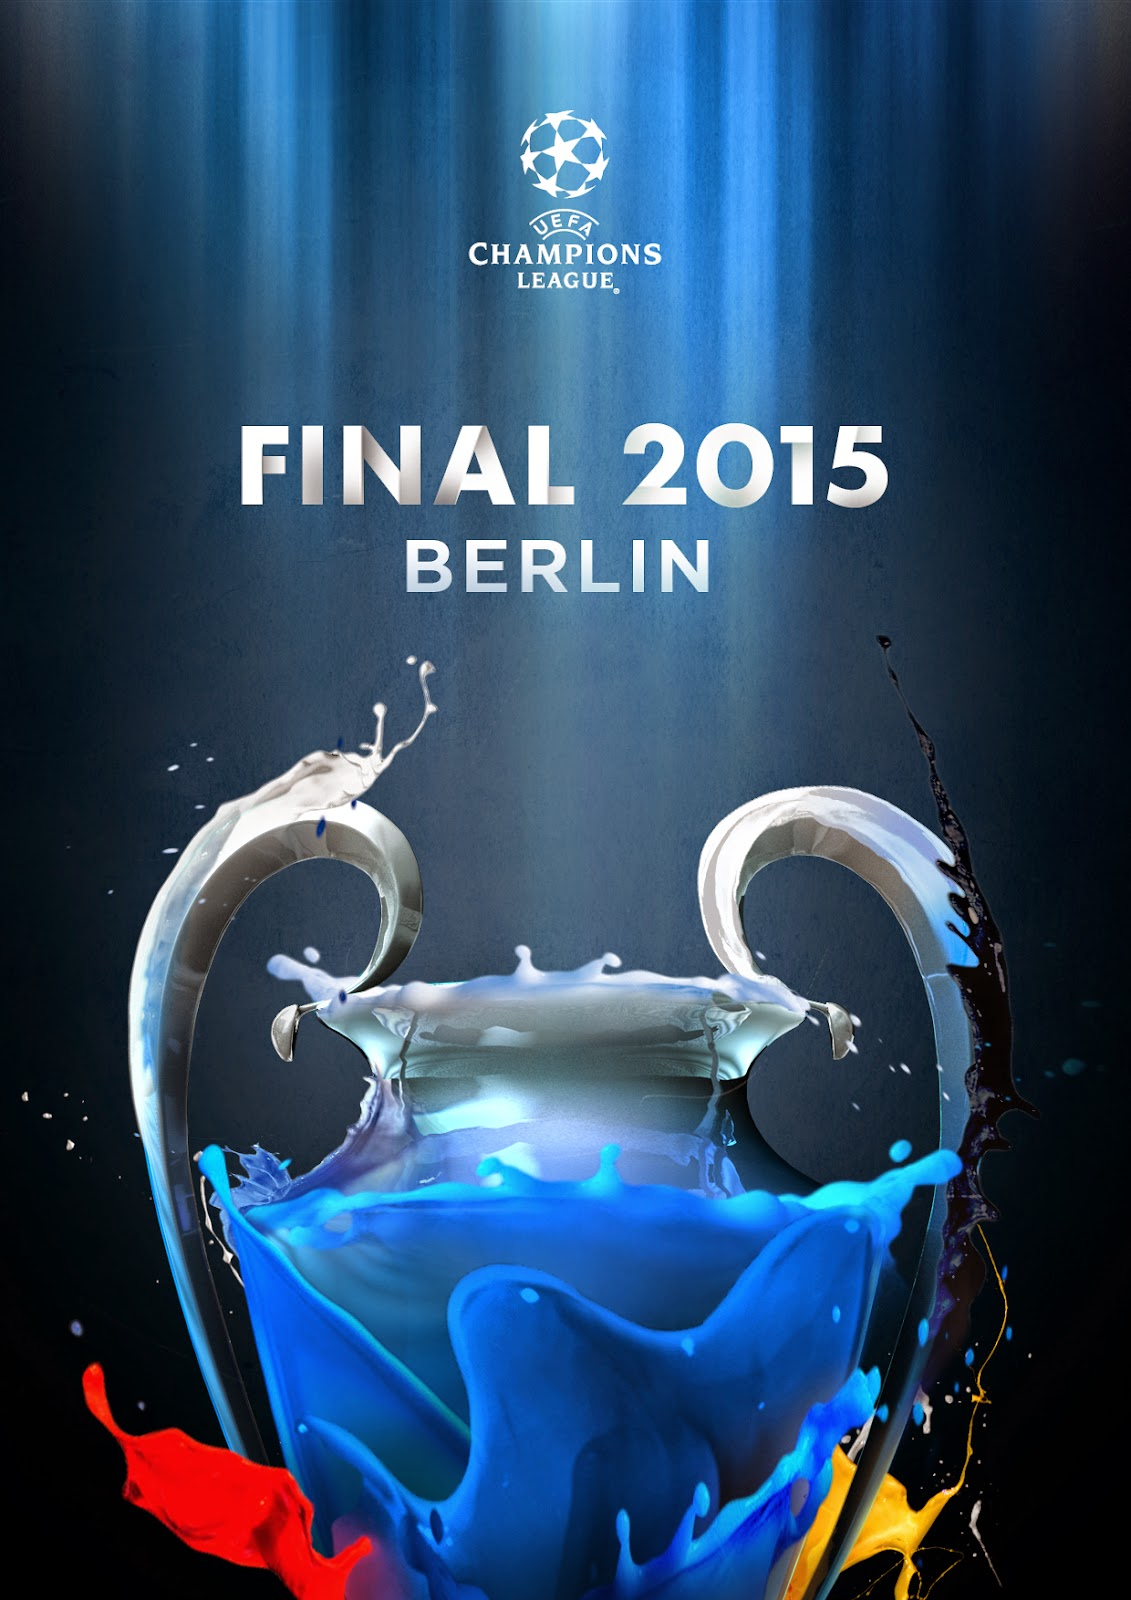 champions league final berlin 2015 dr3am linguaschools barcelona blog champions league final berlin 2015